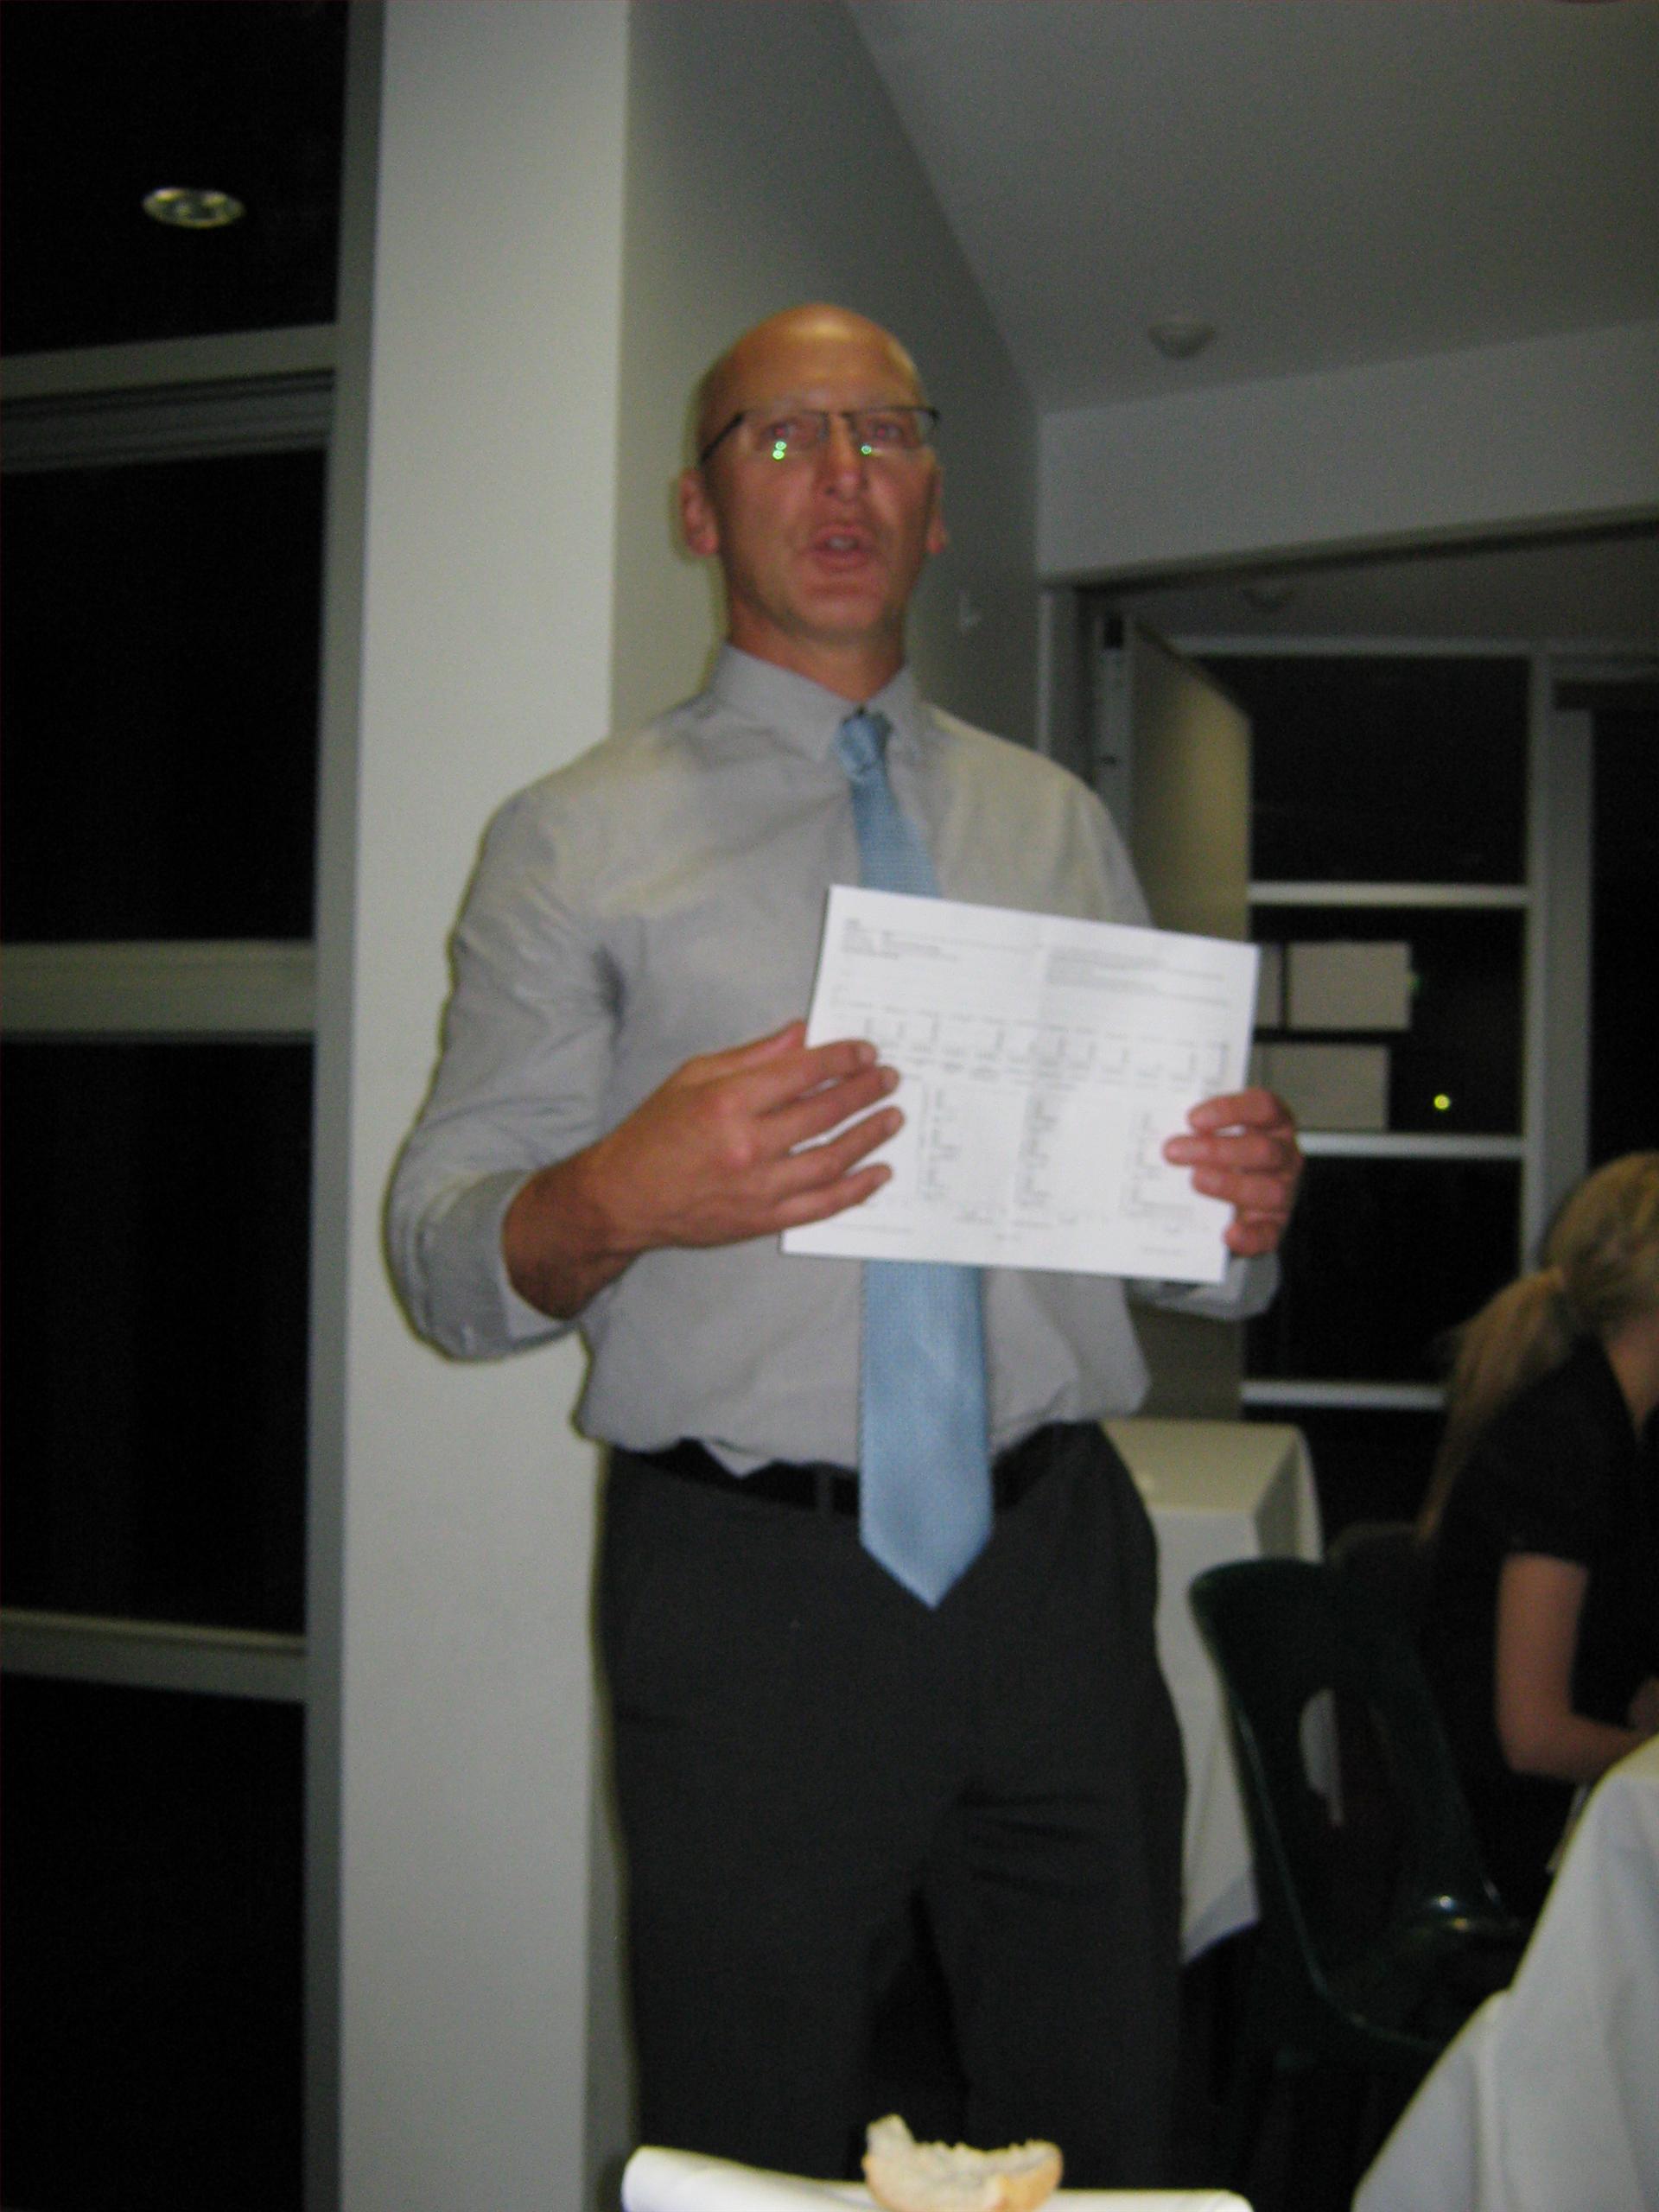 Our Principal Mr Dingle